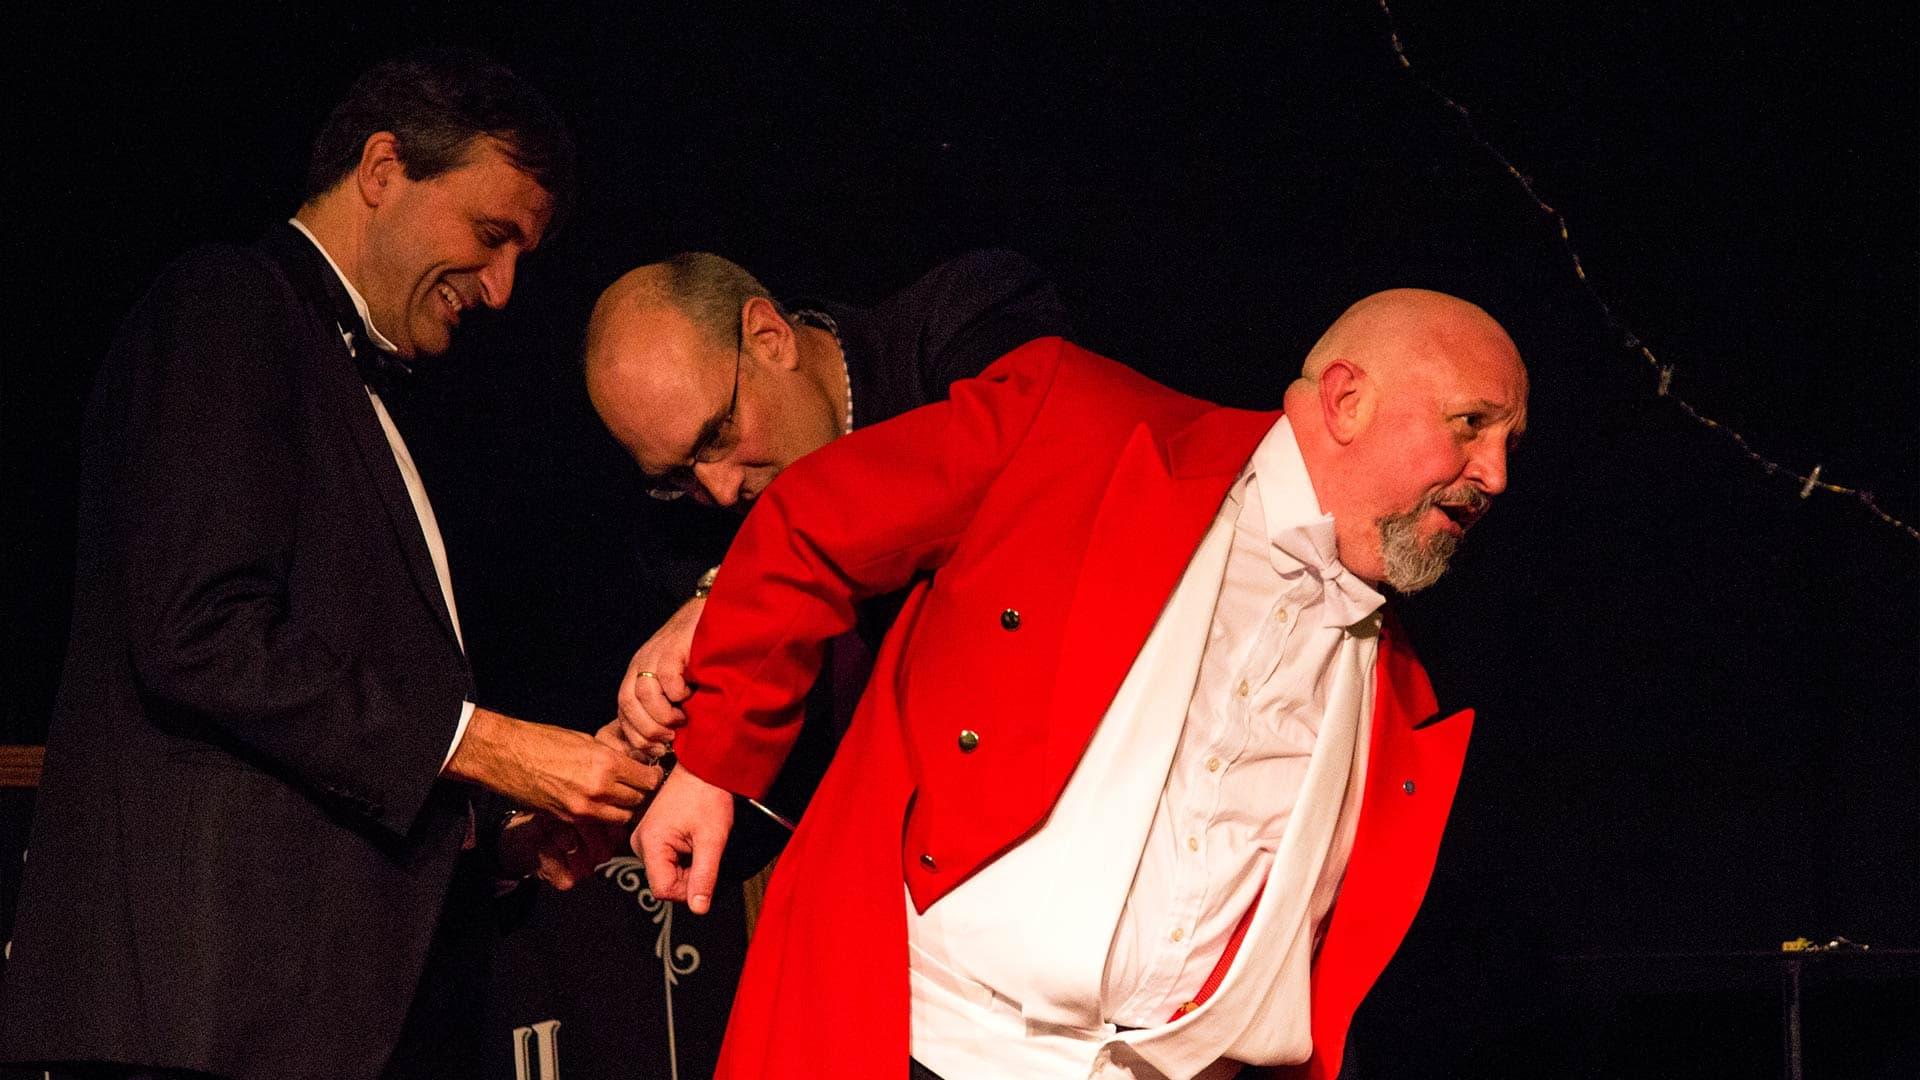 The Great Baldini, Dorset Magician, amazing guests.